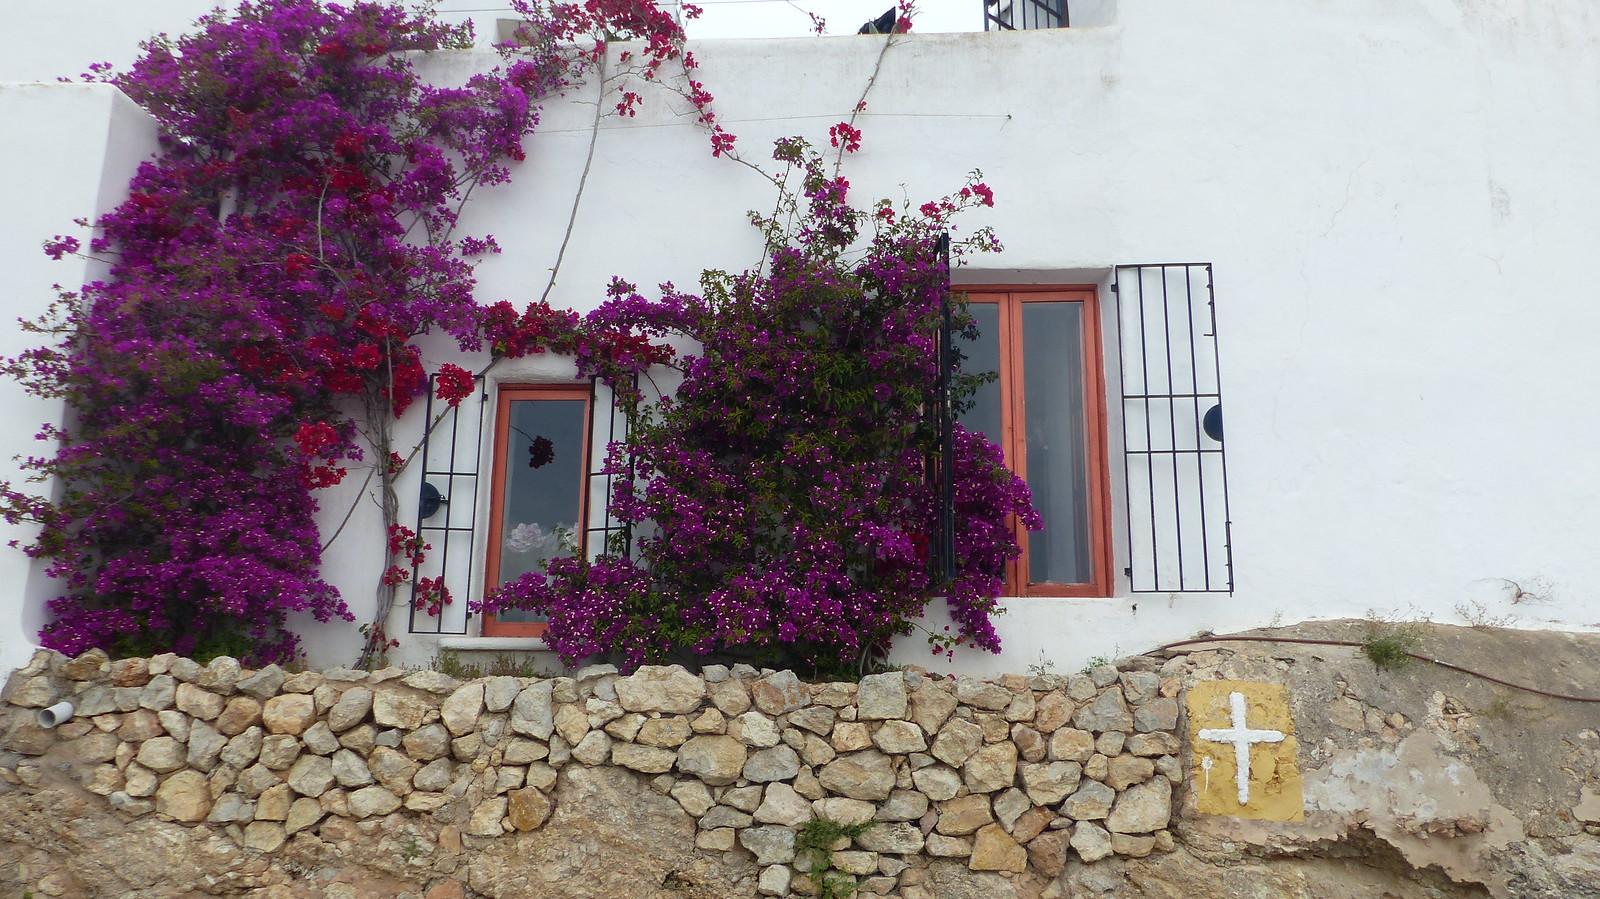 Santa Eulalia des Riu, Ibiza, 27 de mayo 2021